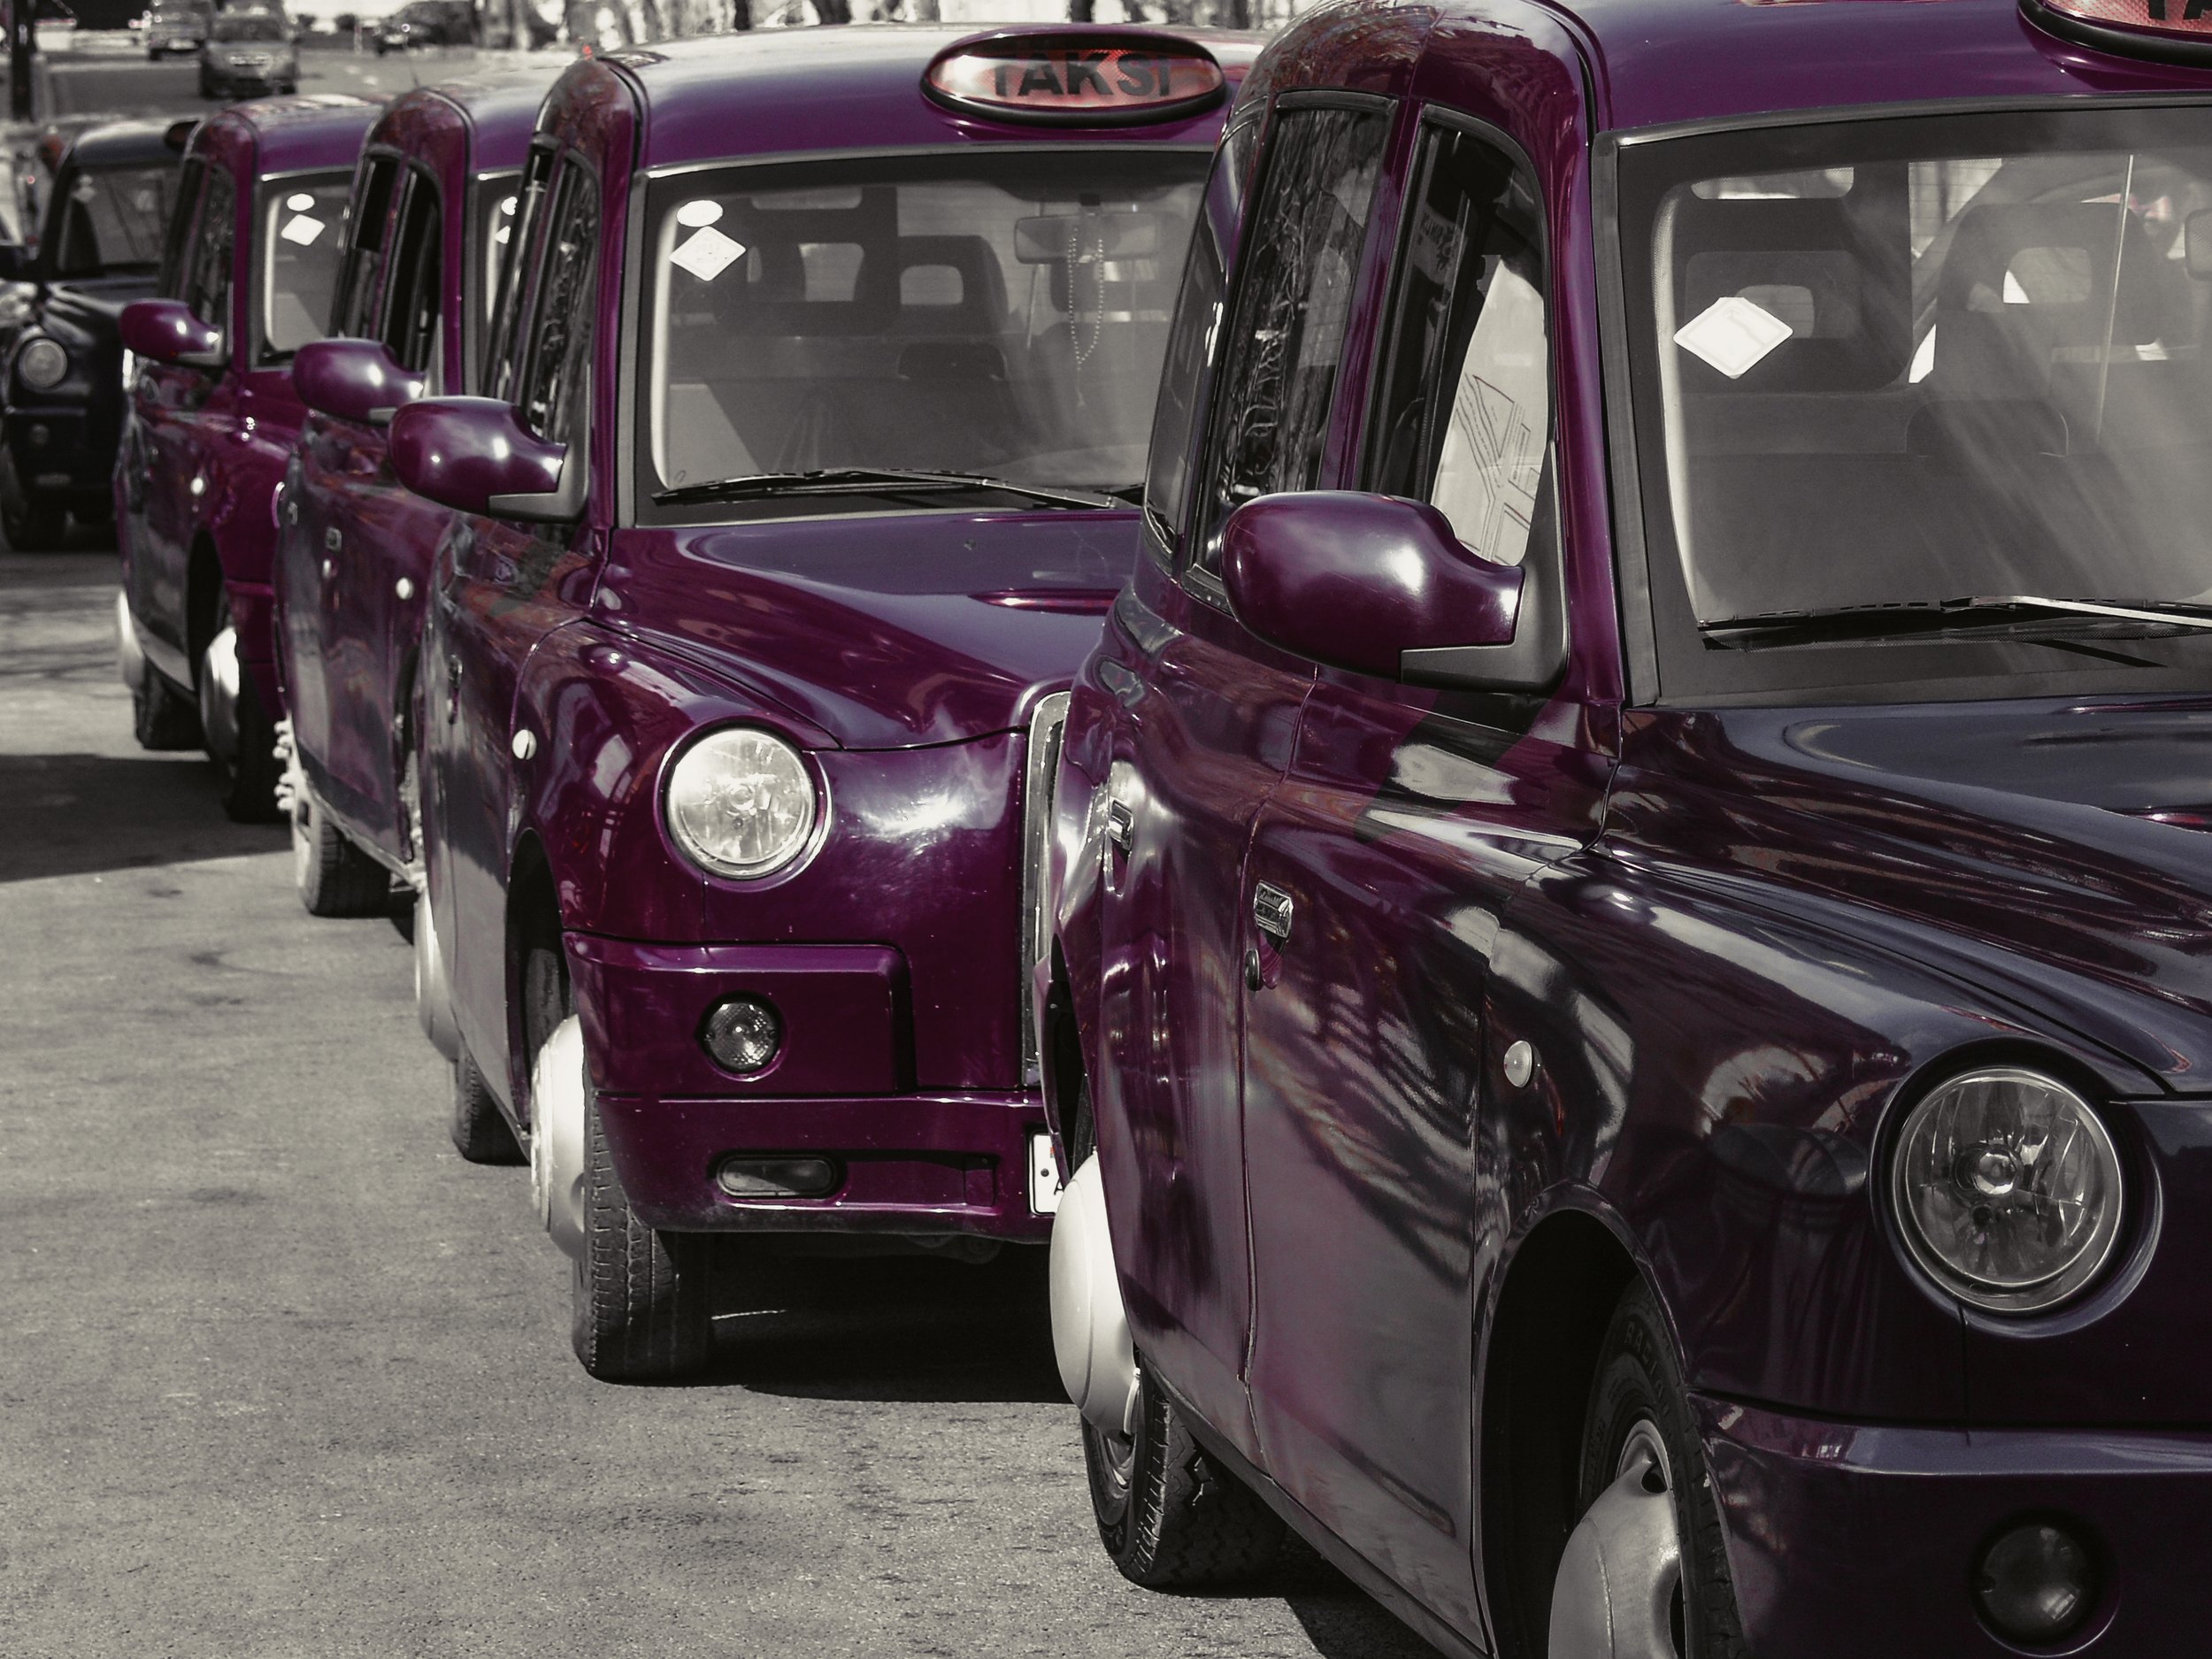 Are taxis safe in Azerbaijan